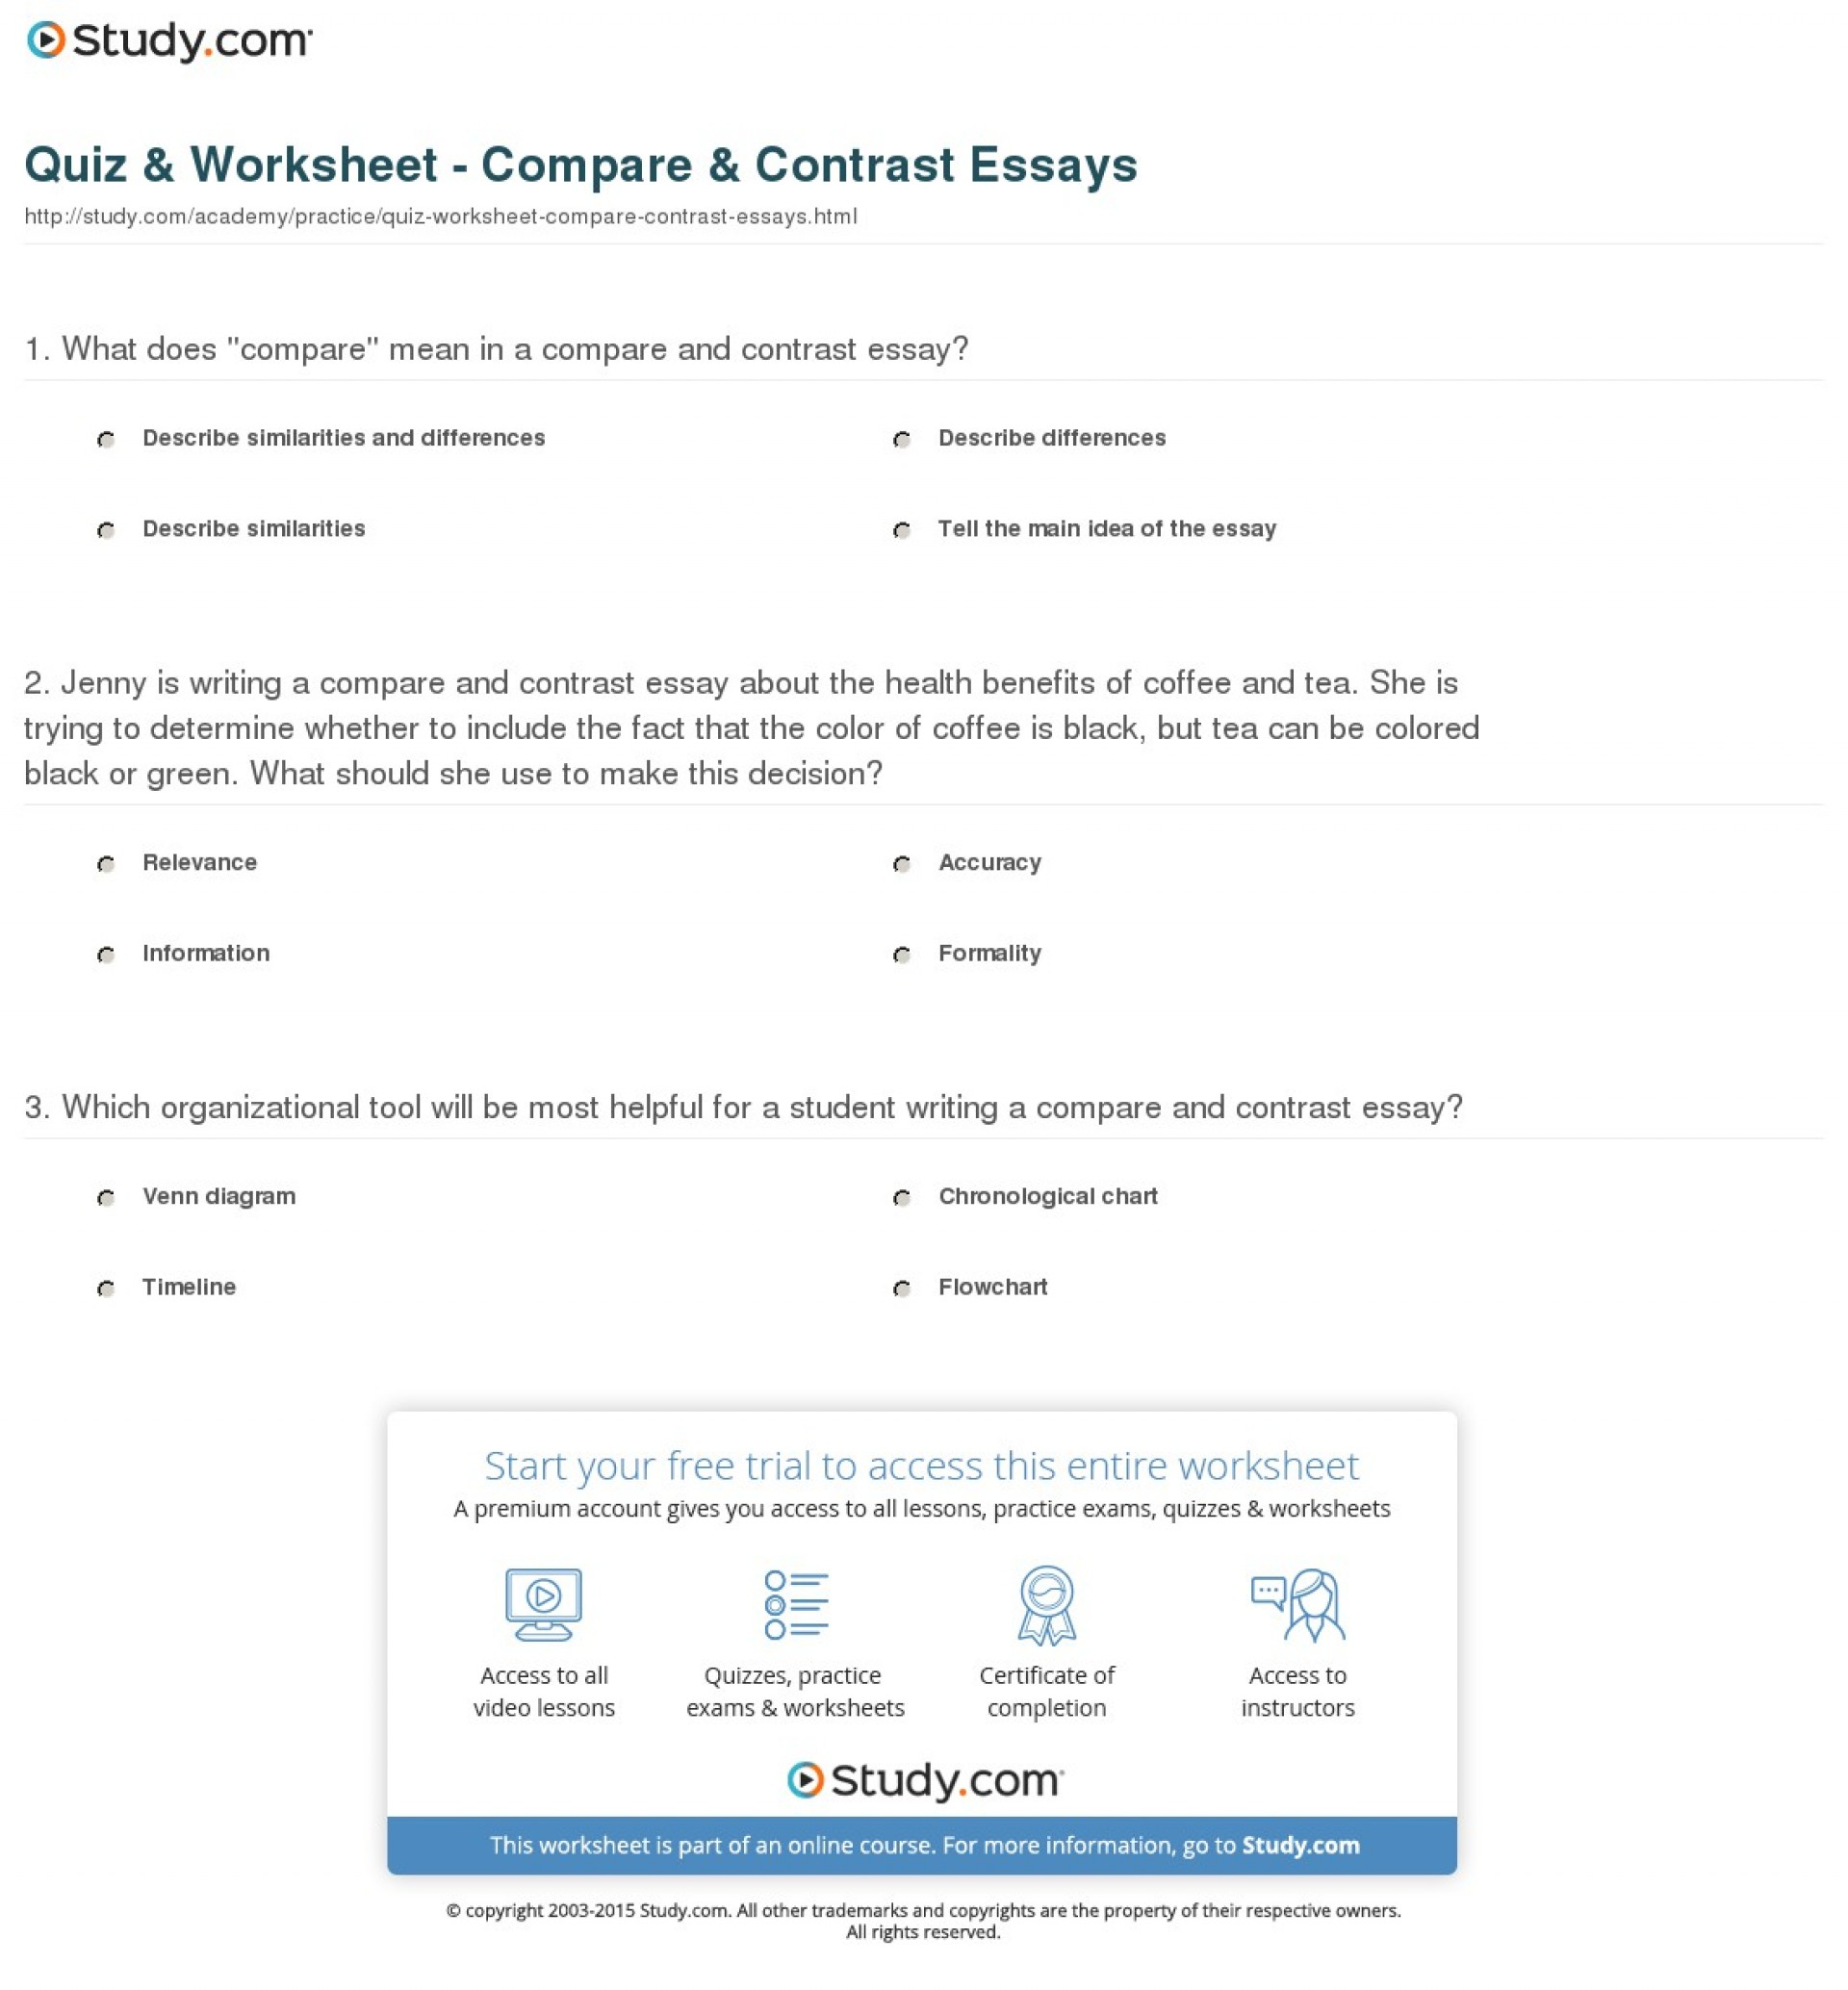 015 Quiz Worksheet Compare Contrast Essays Essay Example Beautiful Comparison Format College Graphic Organizer Pdf Examples 1920